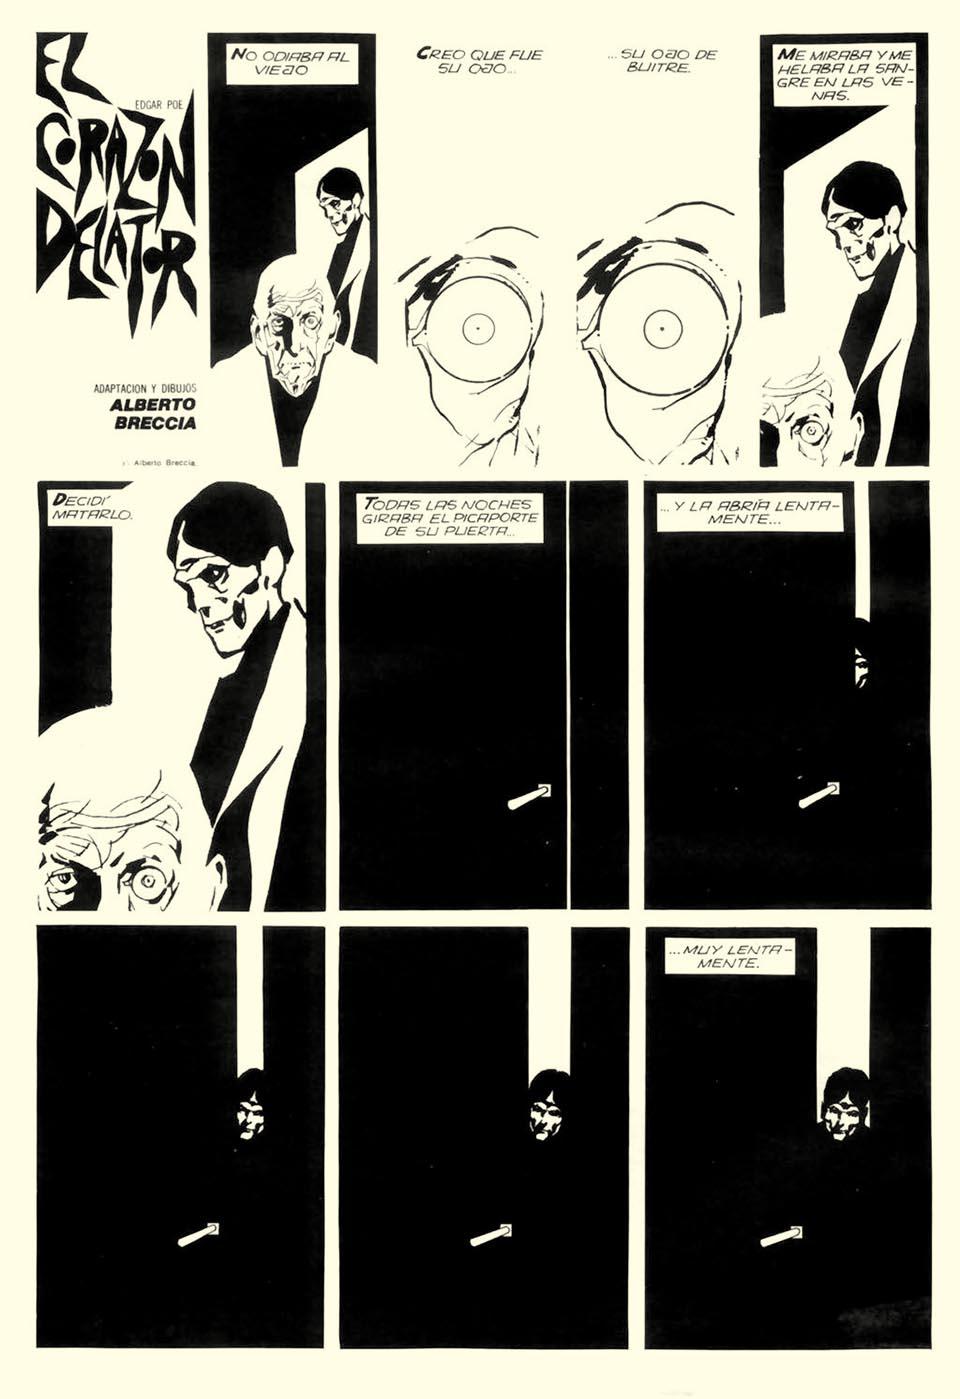 comic creator spotlight the life and work of alberto breccia pages from alberto breccia s distinctive 1977 adaptation of edgar allan poe s story tell tale heart